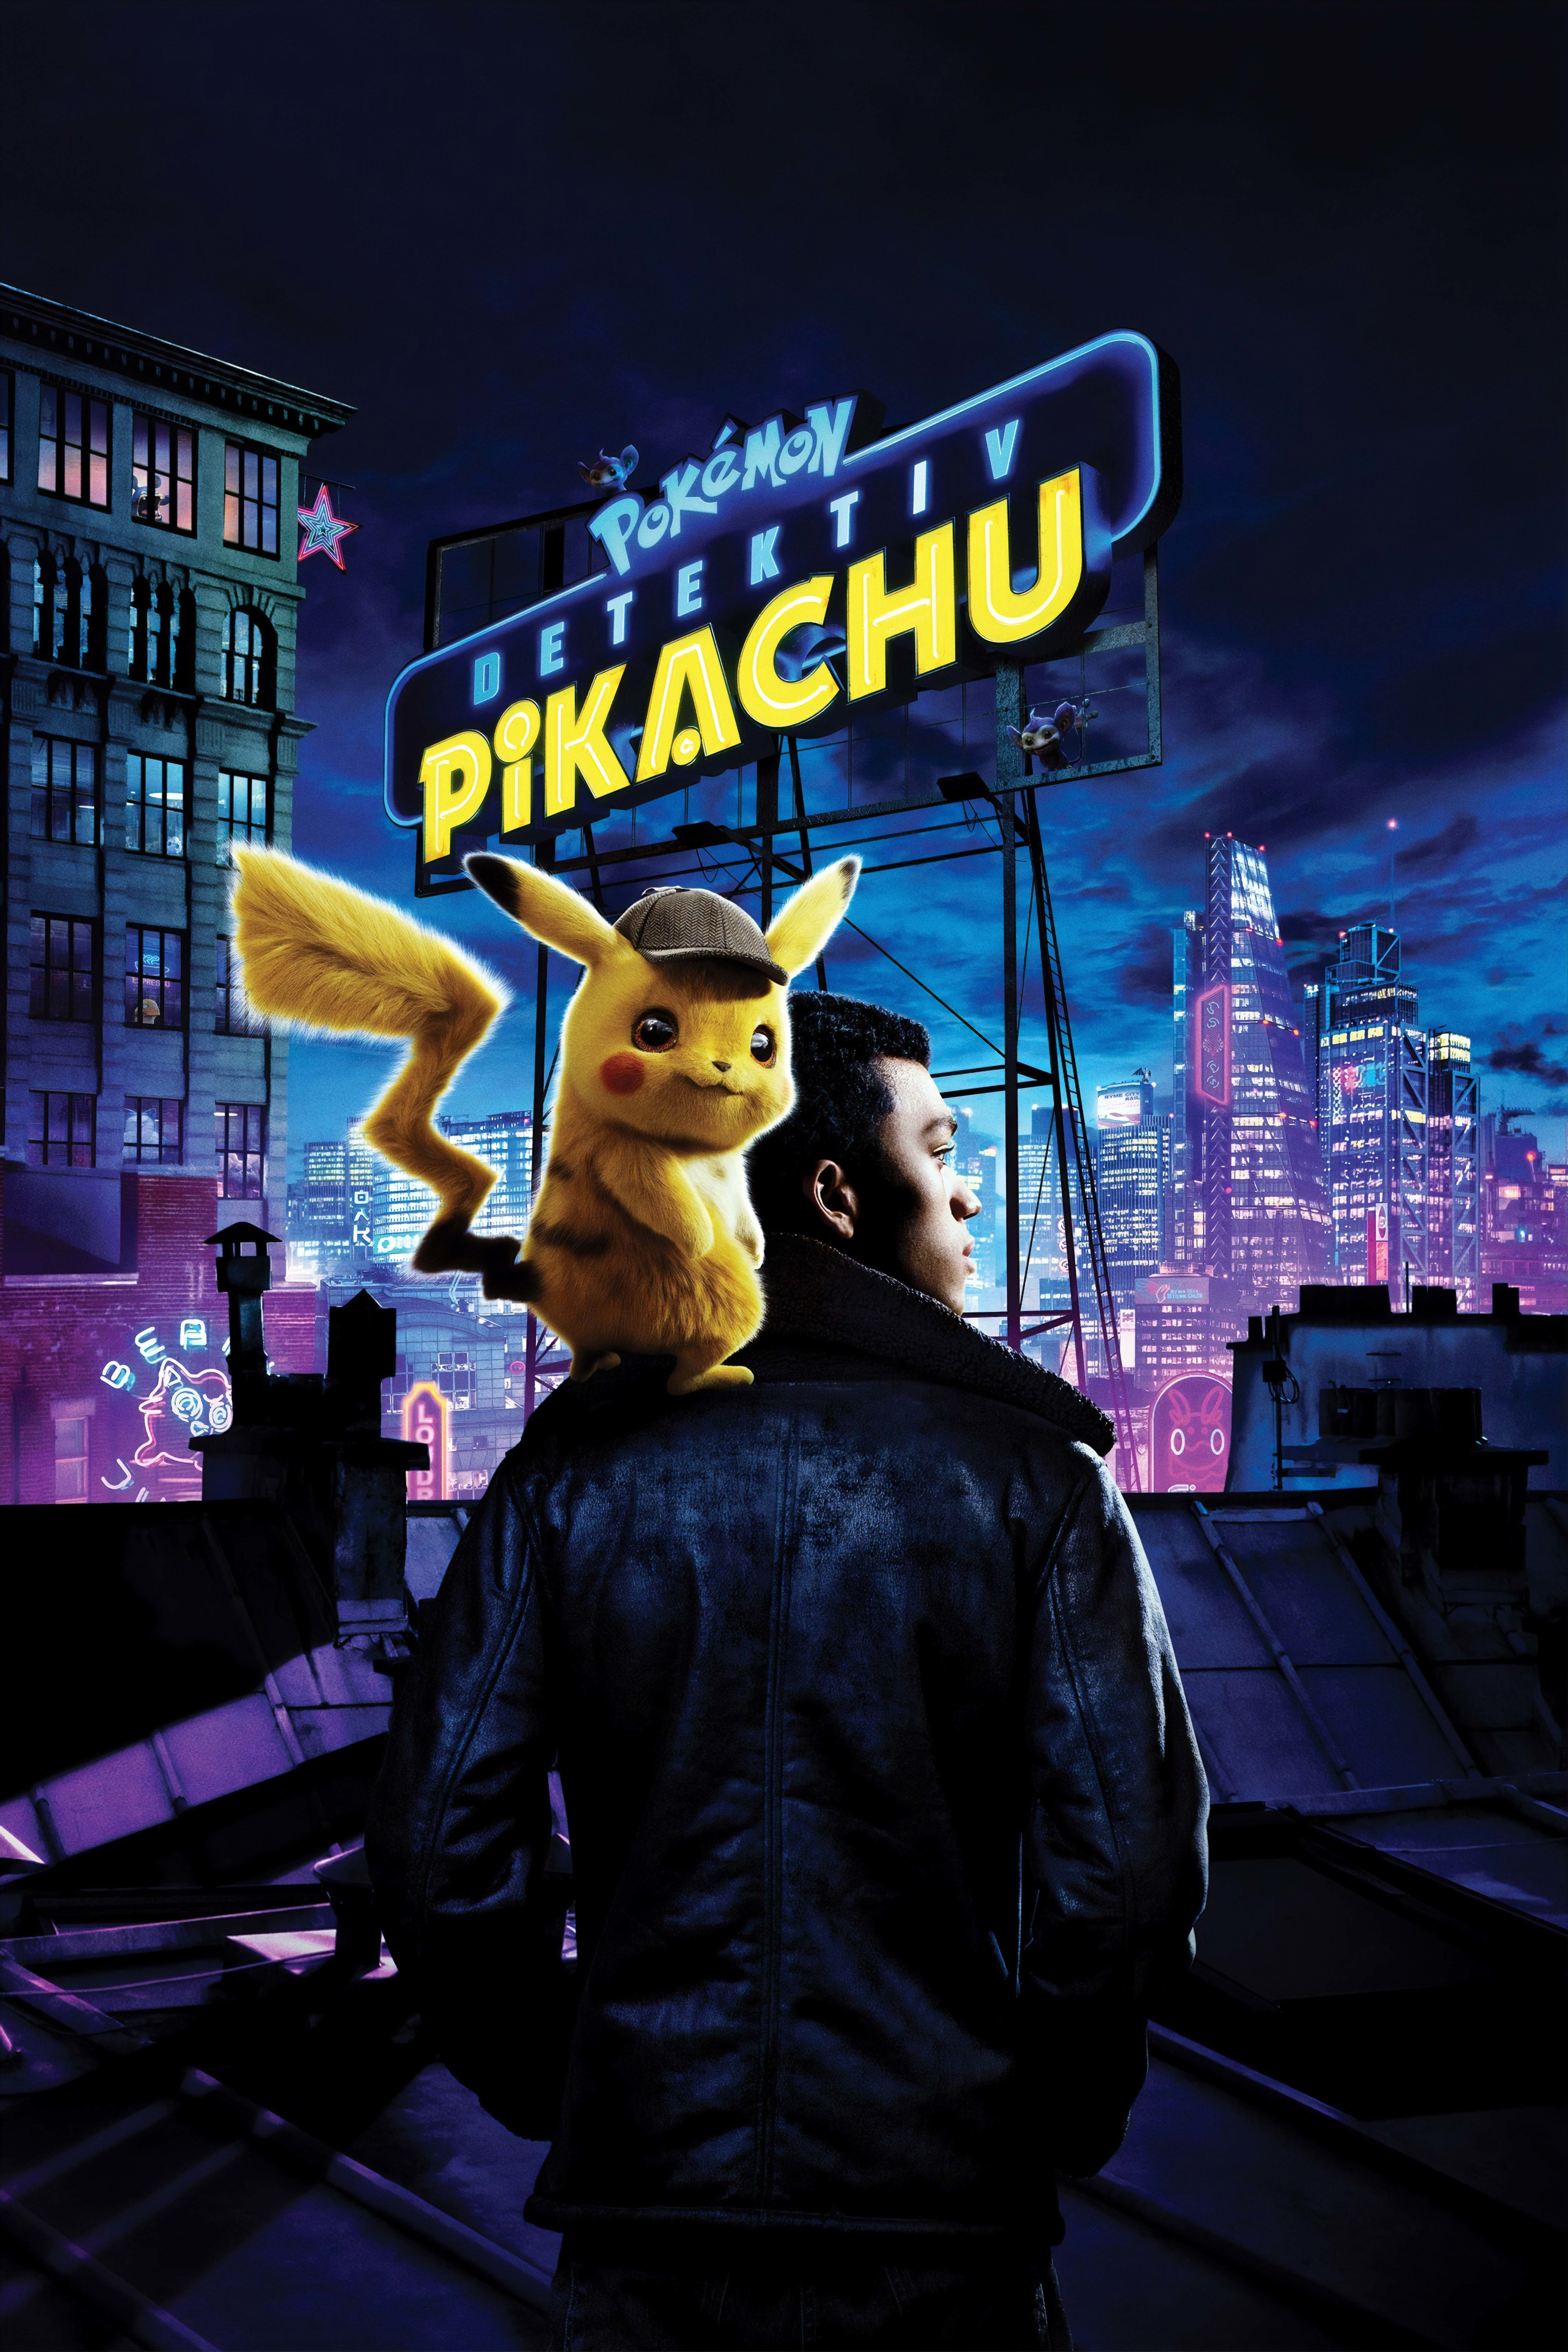 Detective pikachu movie wallpaper hd movies 4k wallpapers - Movie poster wallpaper ...